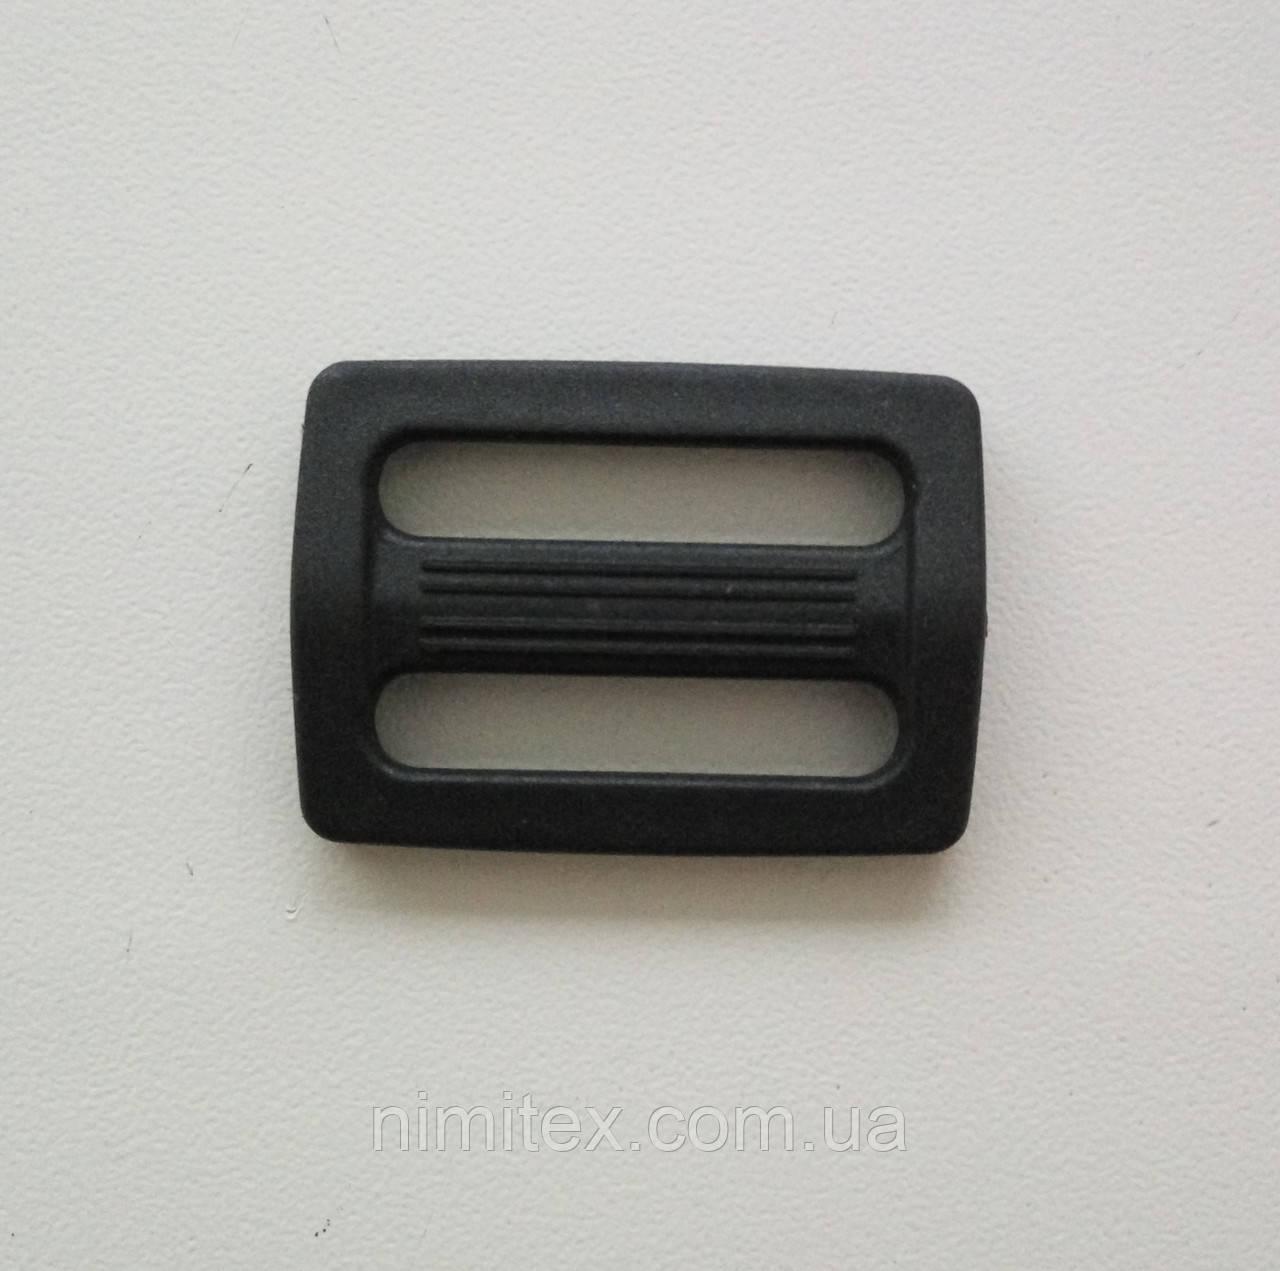 Регулятор пластик 24 мм черный